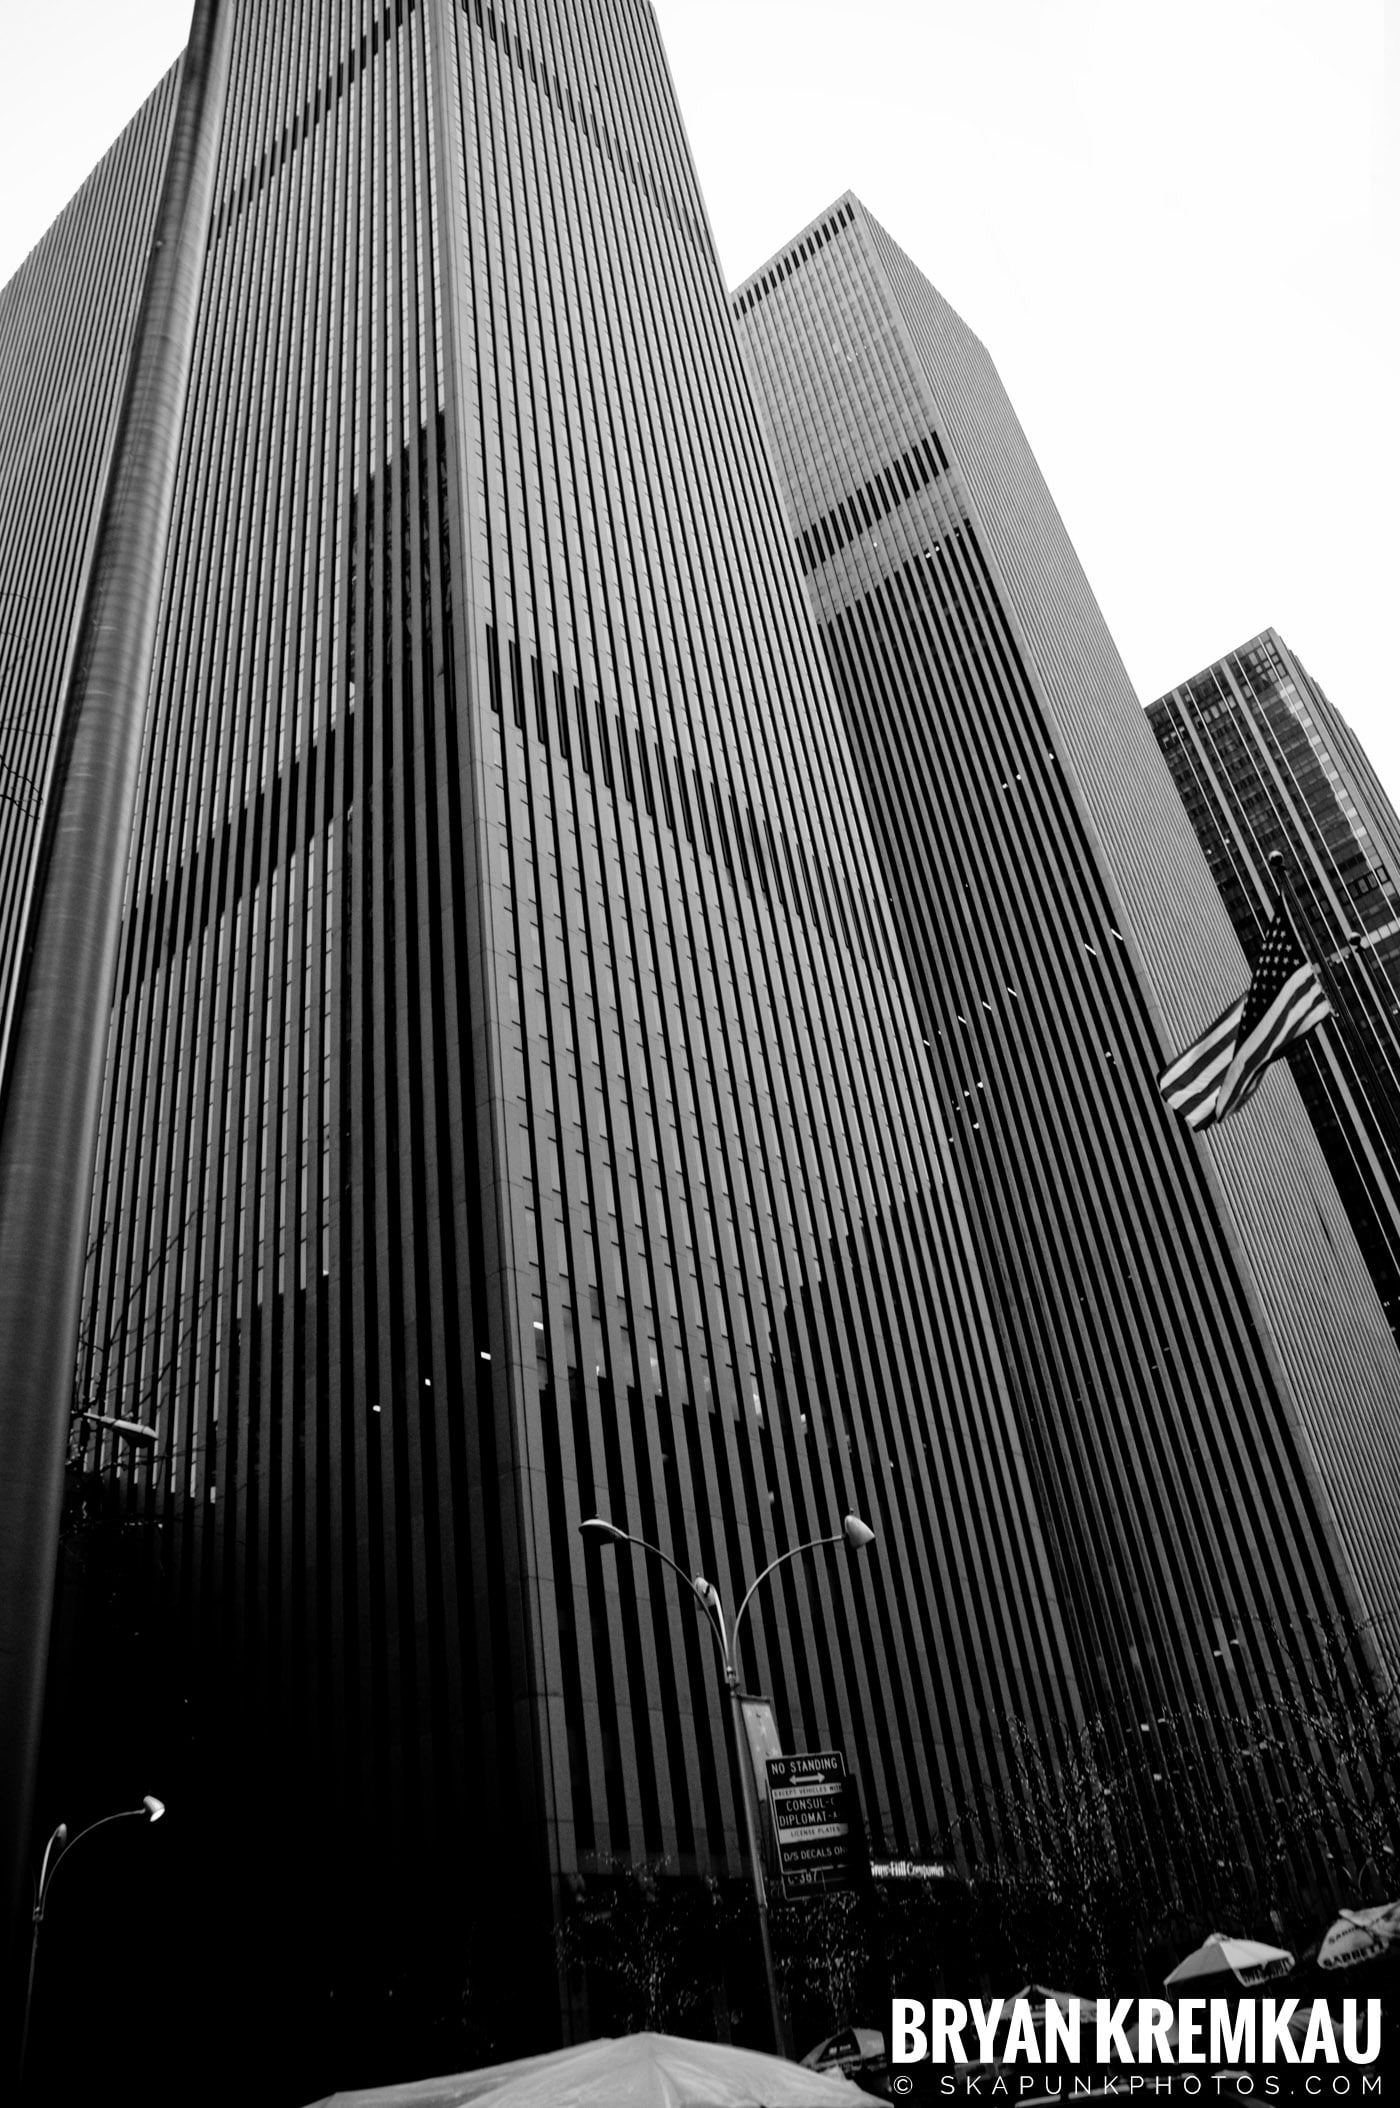 NYC Holiday Trip - 12.20.08 (56)